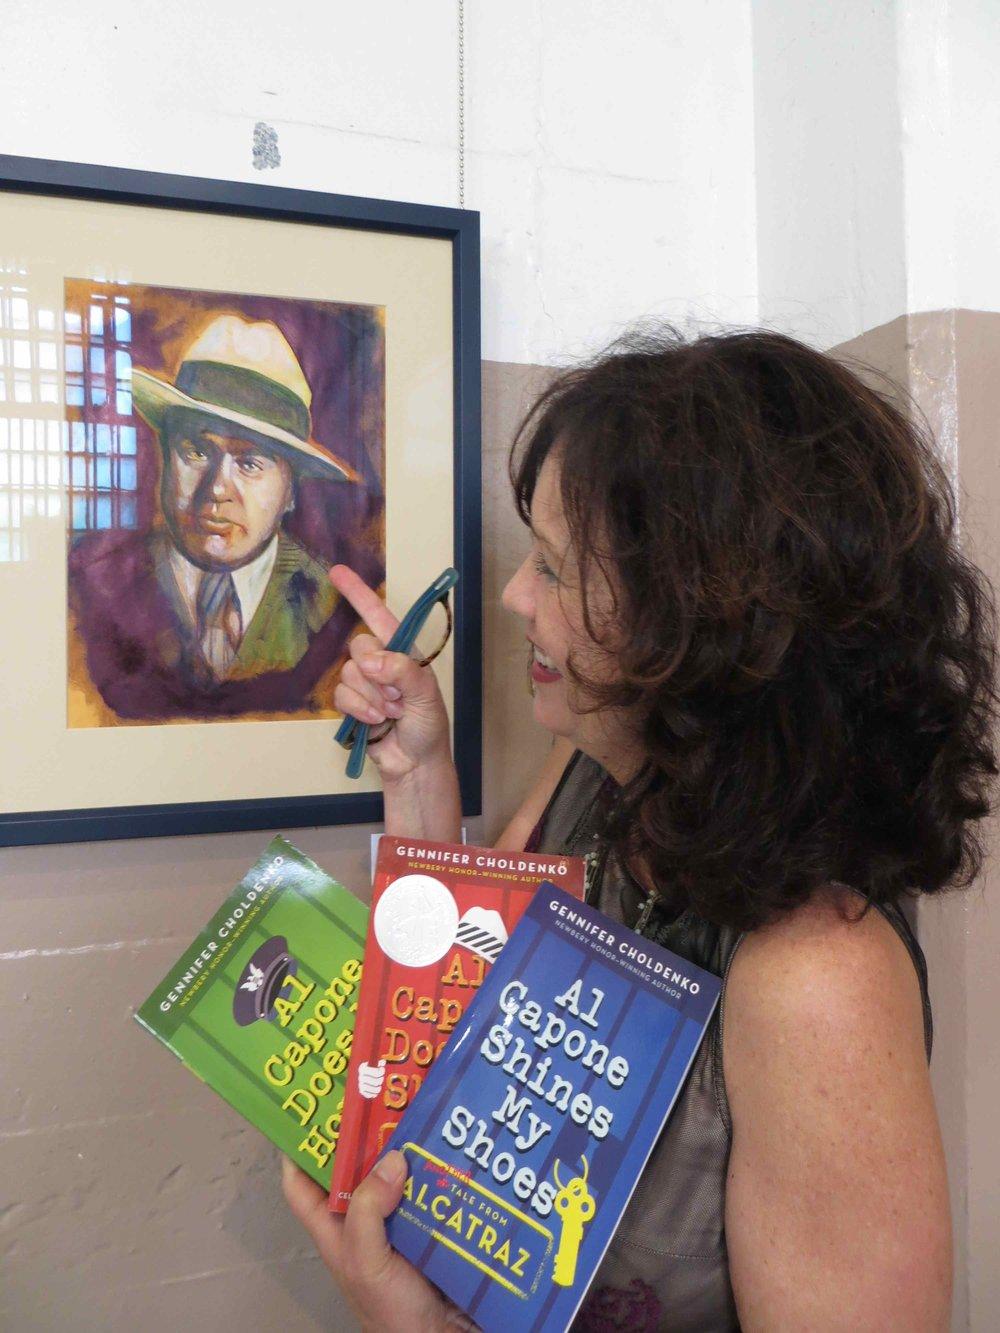 Gennifer Choldenko, her books and Capone.jpg